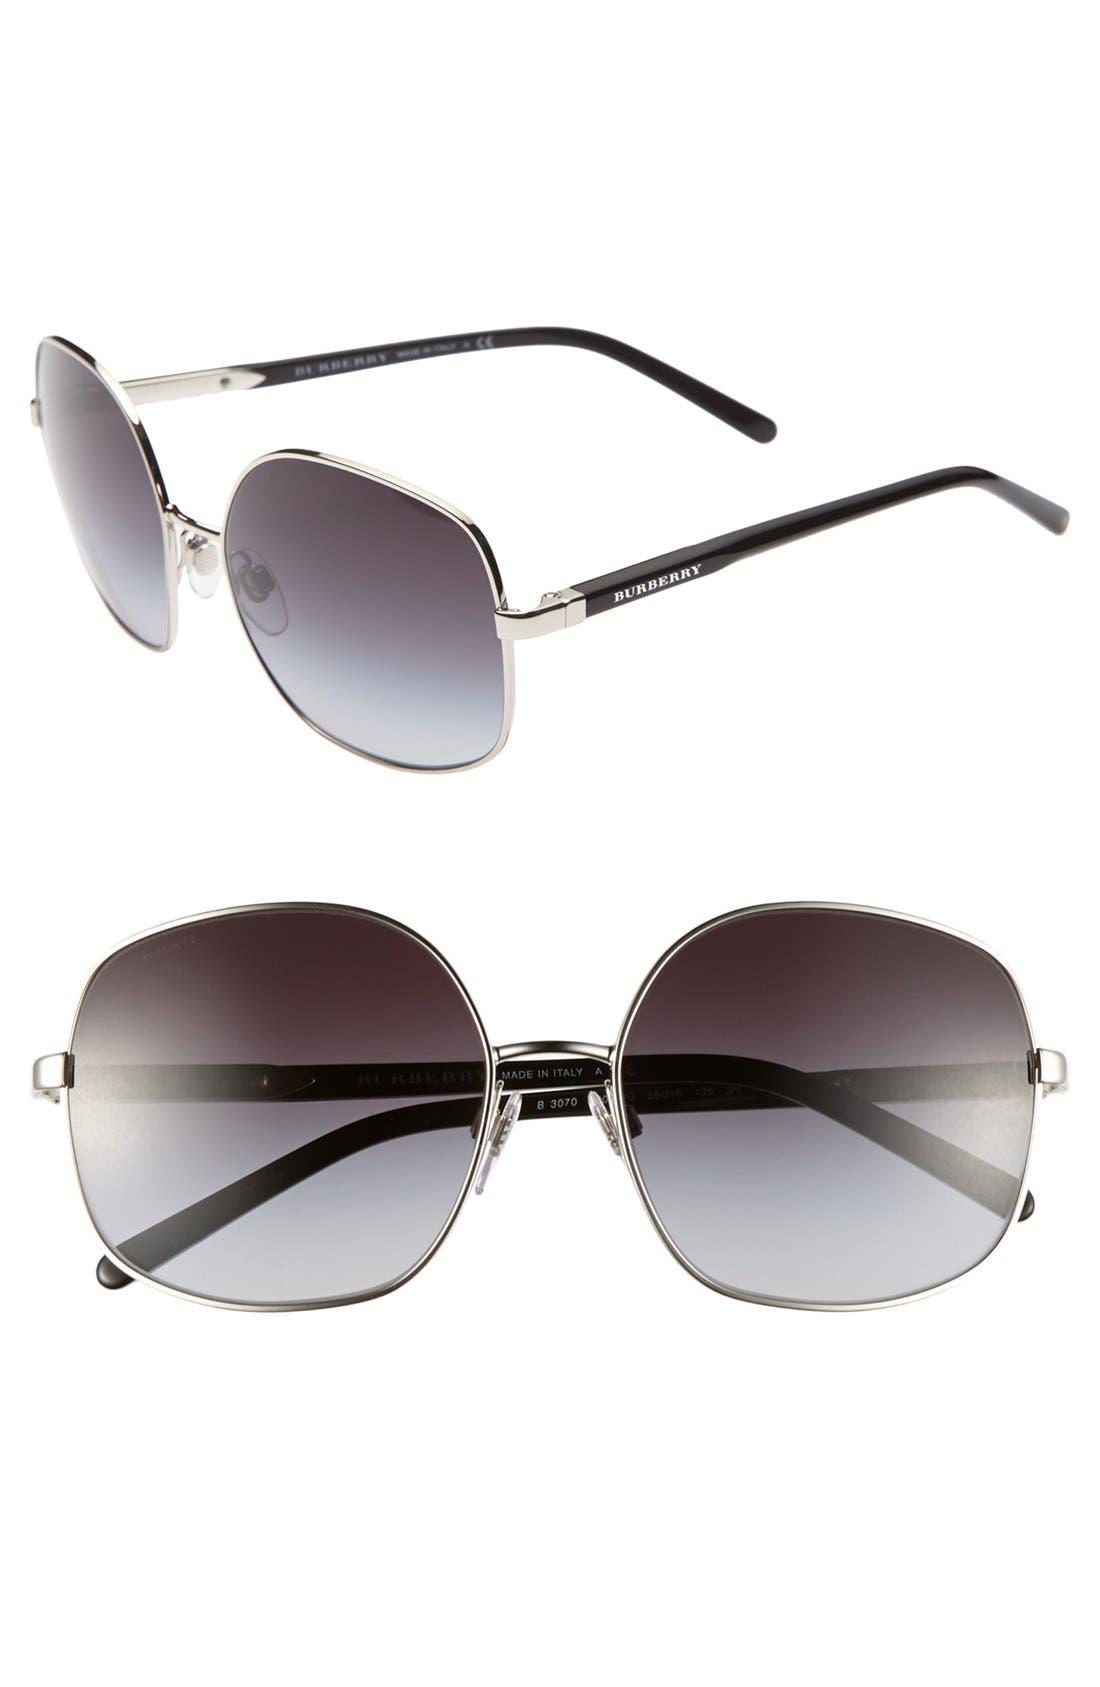 Main Image - Burberry 56mm Wire Rim Sunglasses